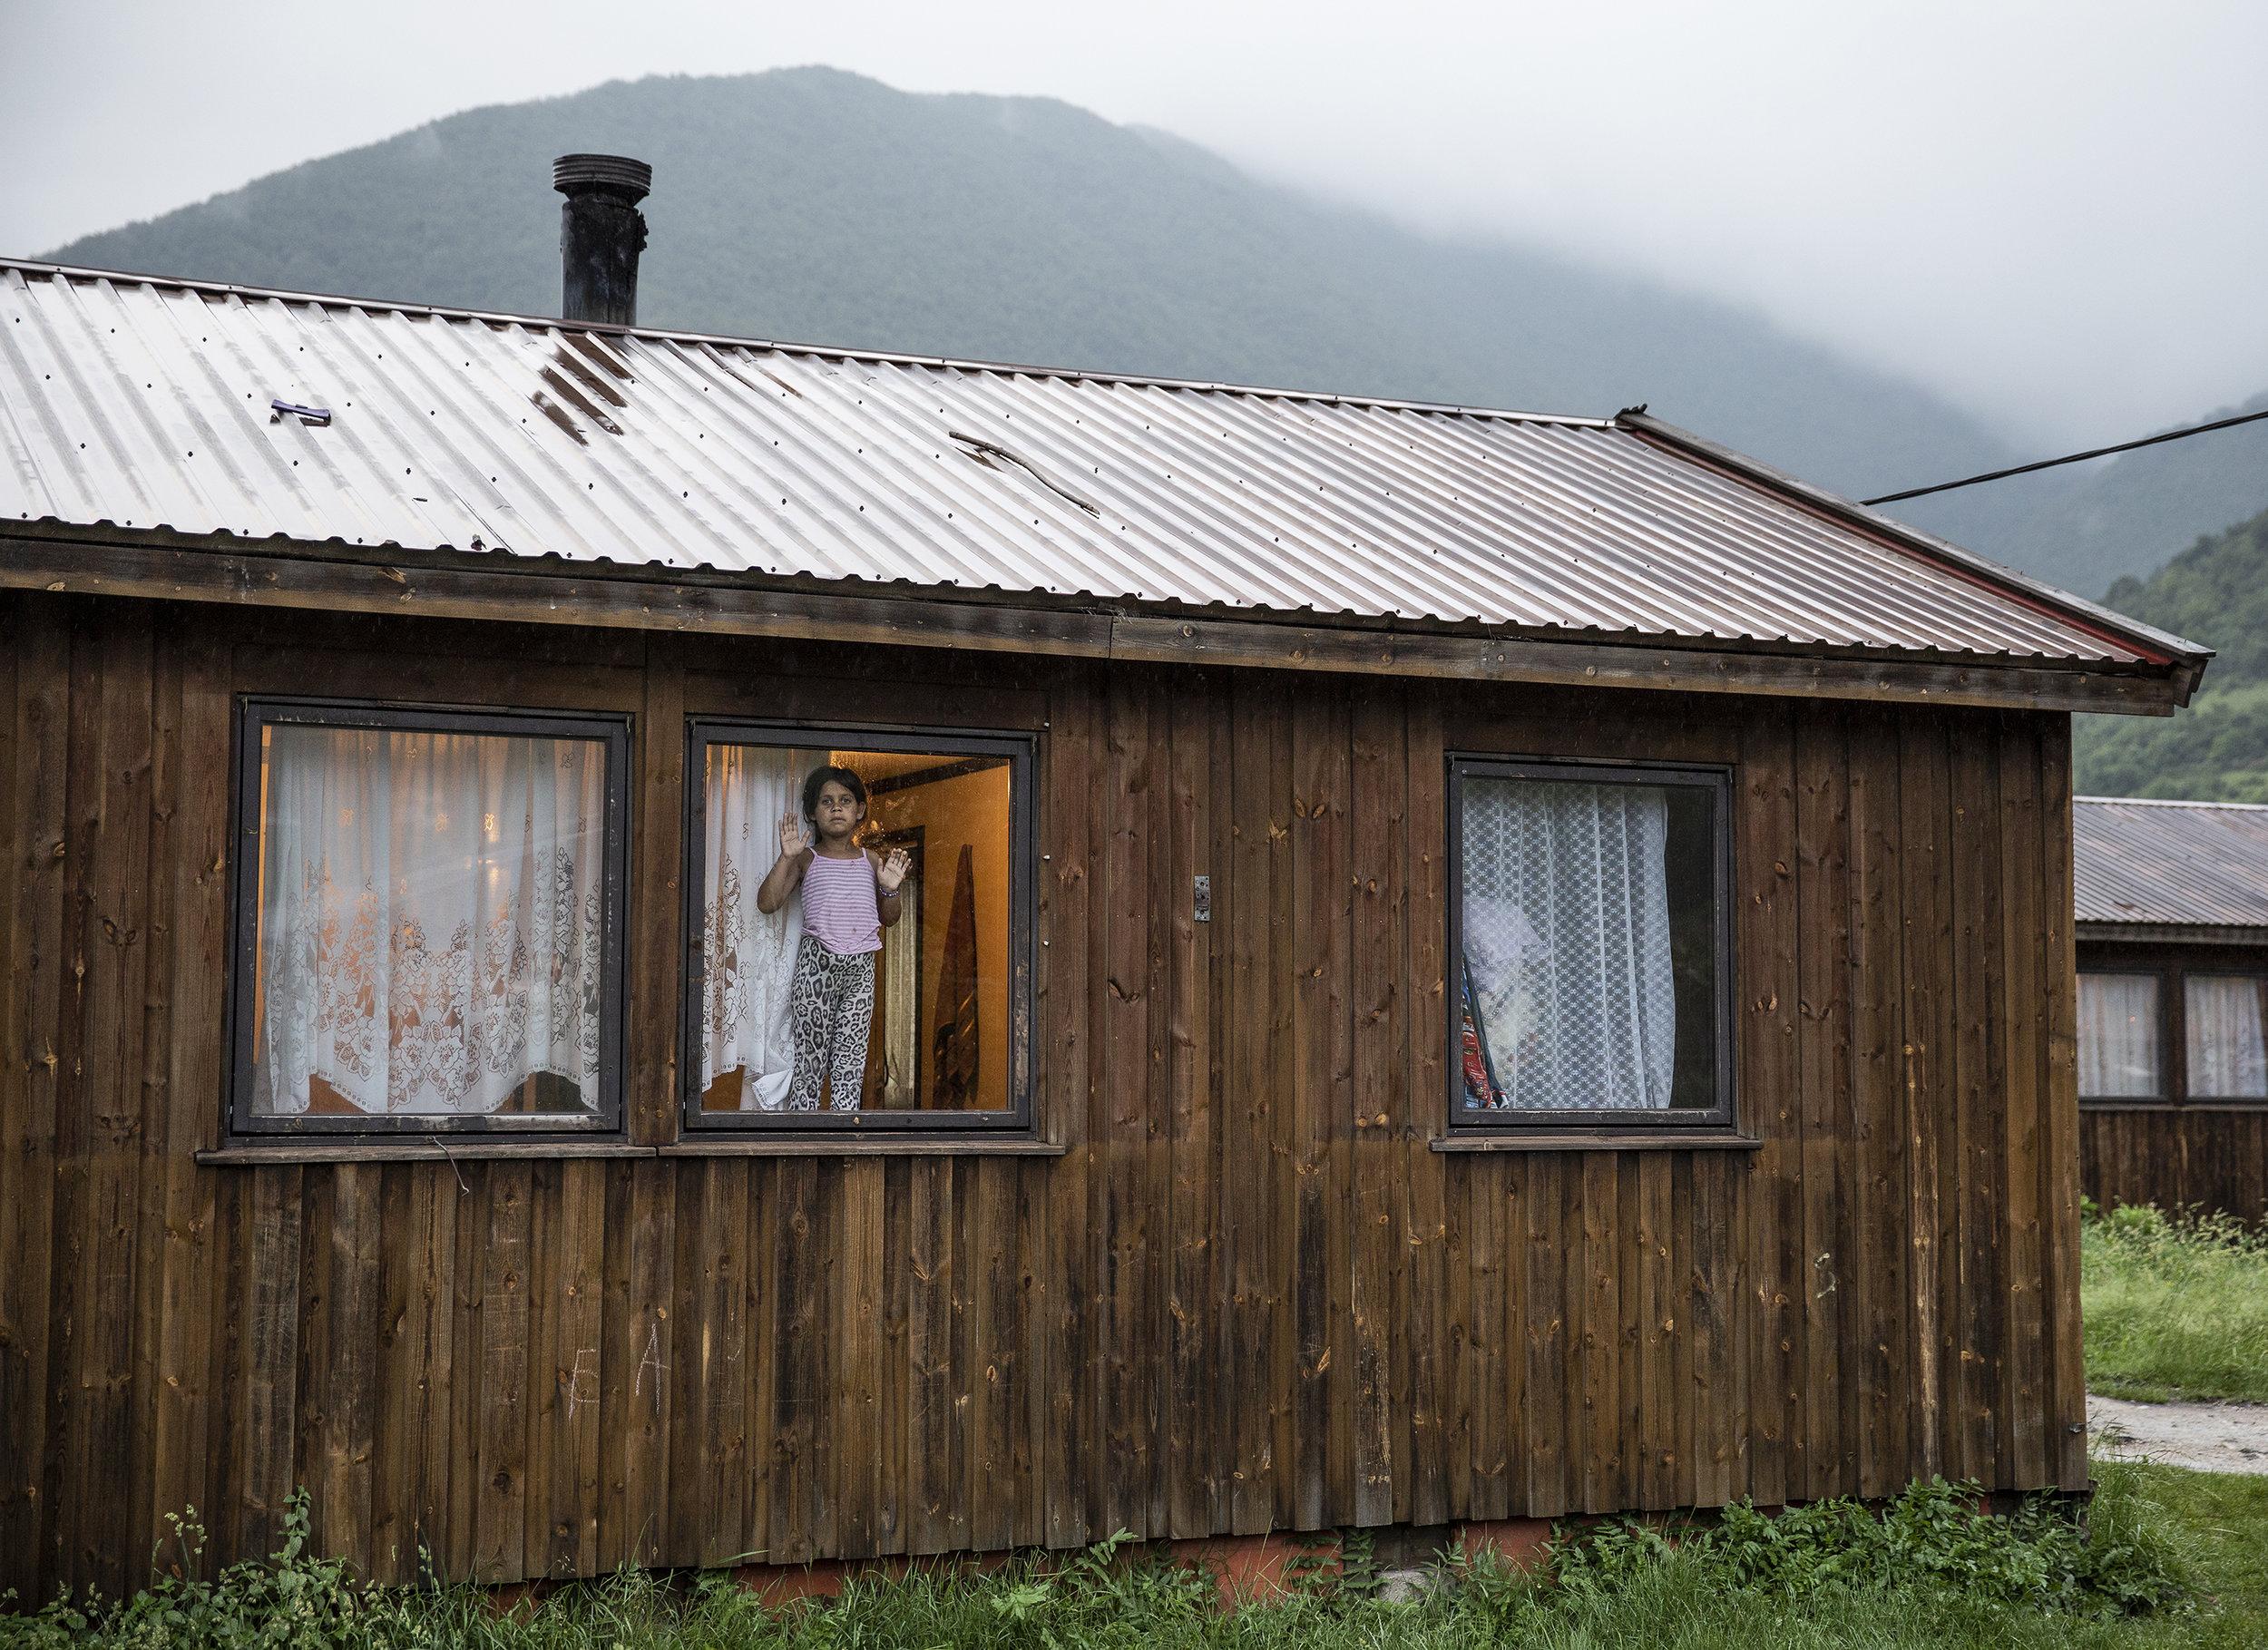 "'Roma Forgotten', 24"" x 36"" (framed), photographed 2017 in Bosnia-Herzegovina"